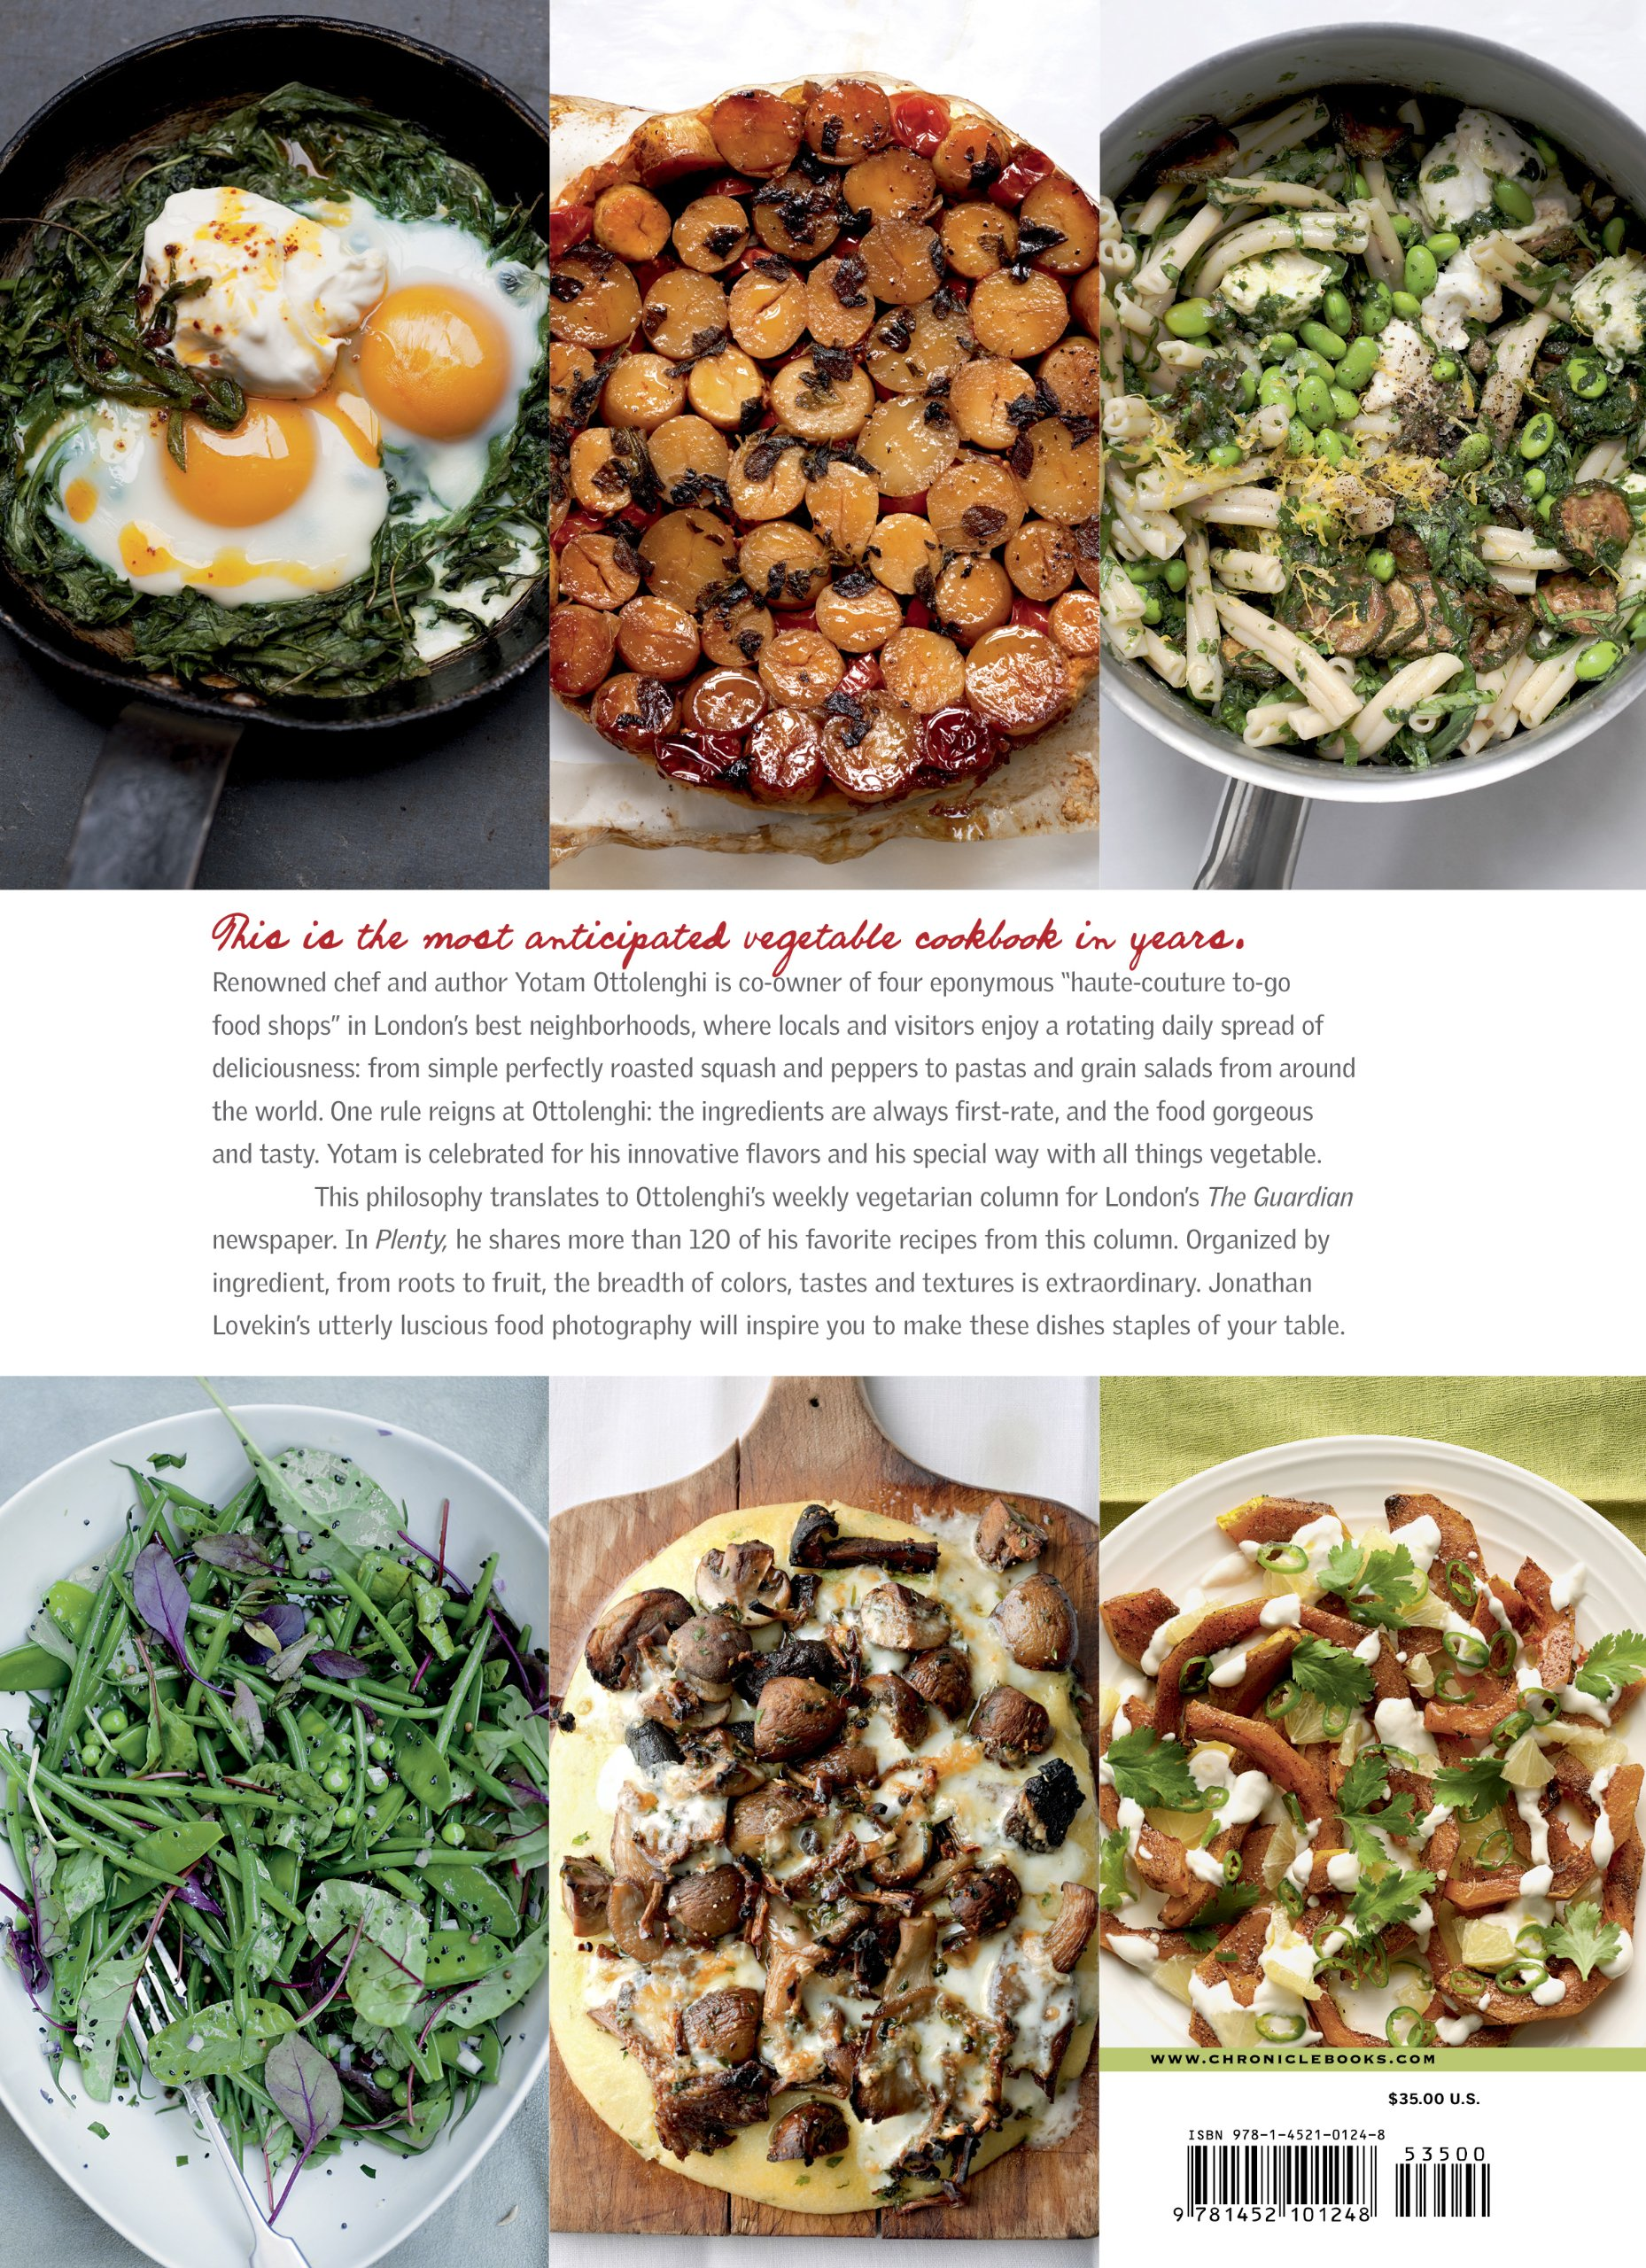 Green Kitchen Stories Book Plenty Vibrant Vegetable Recipes From Londons Ottolenghi Yotam